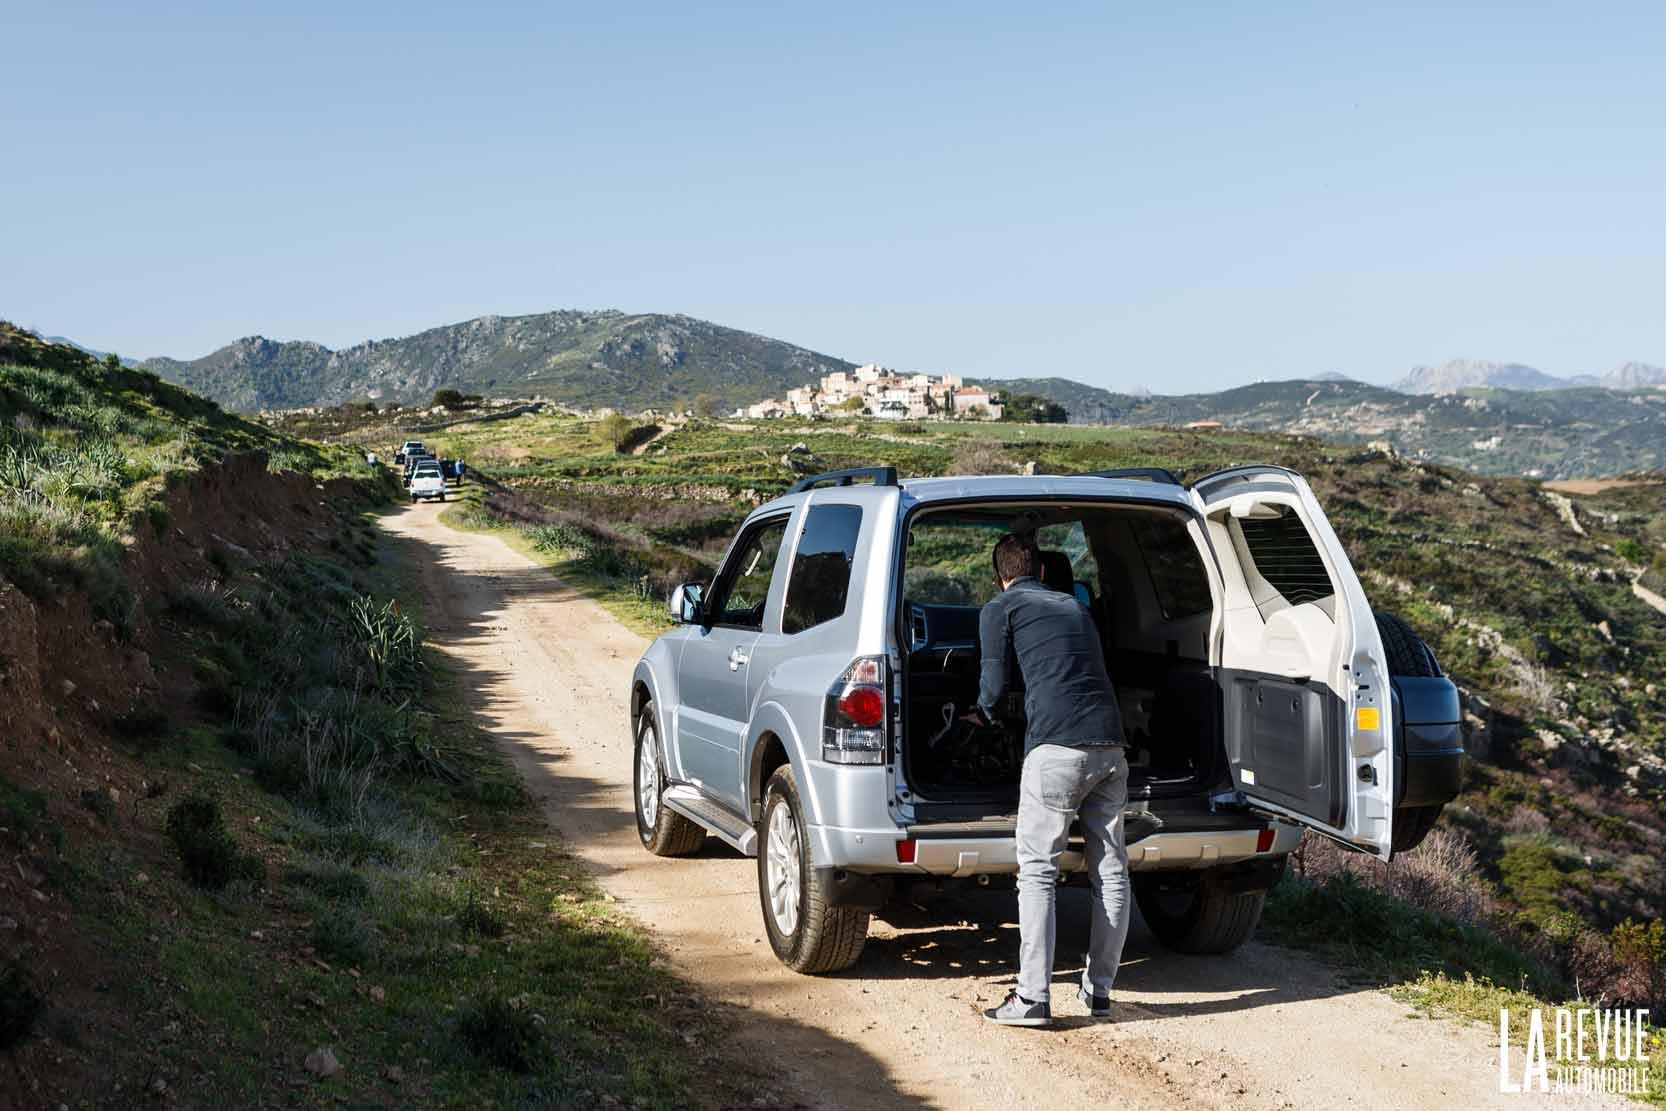 Essai du Mitsubishi Pajero, un 4x4 dans la pampa en Corse